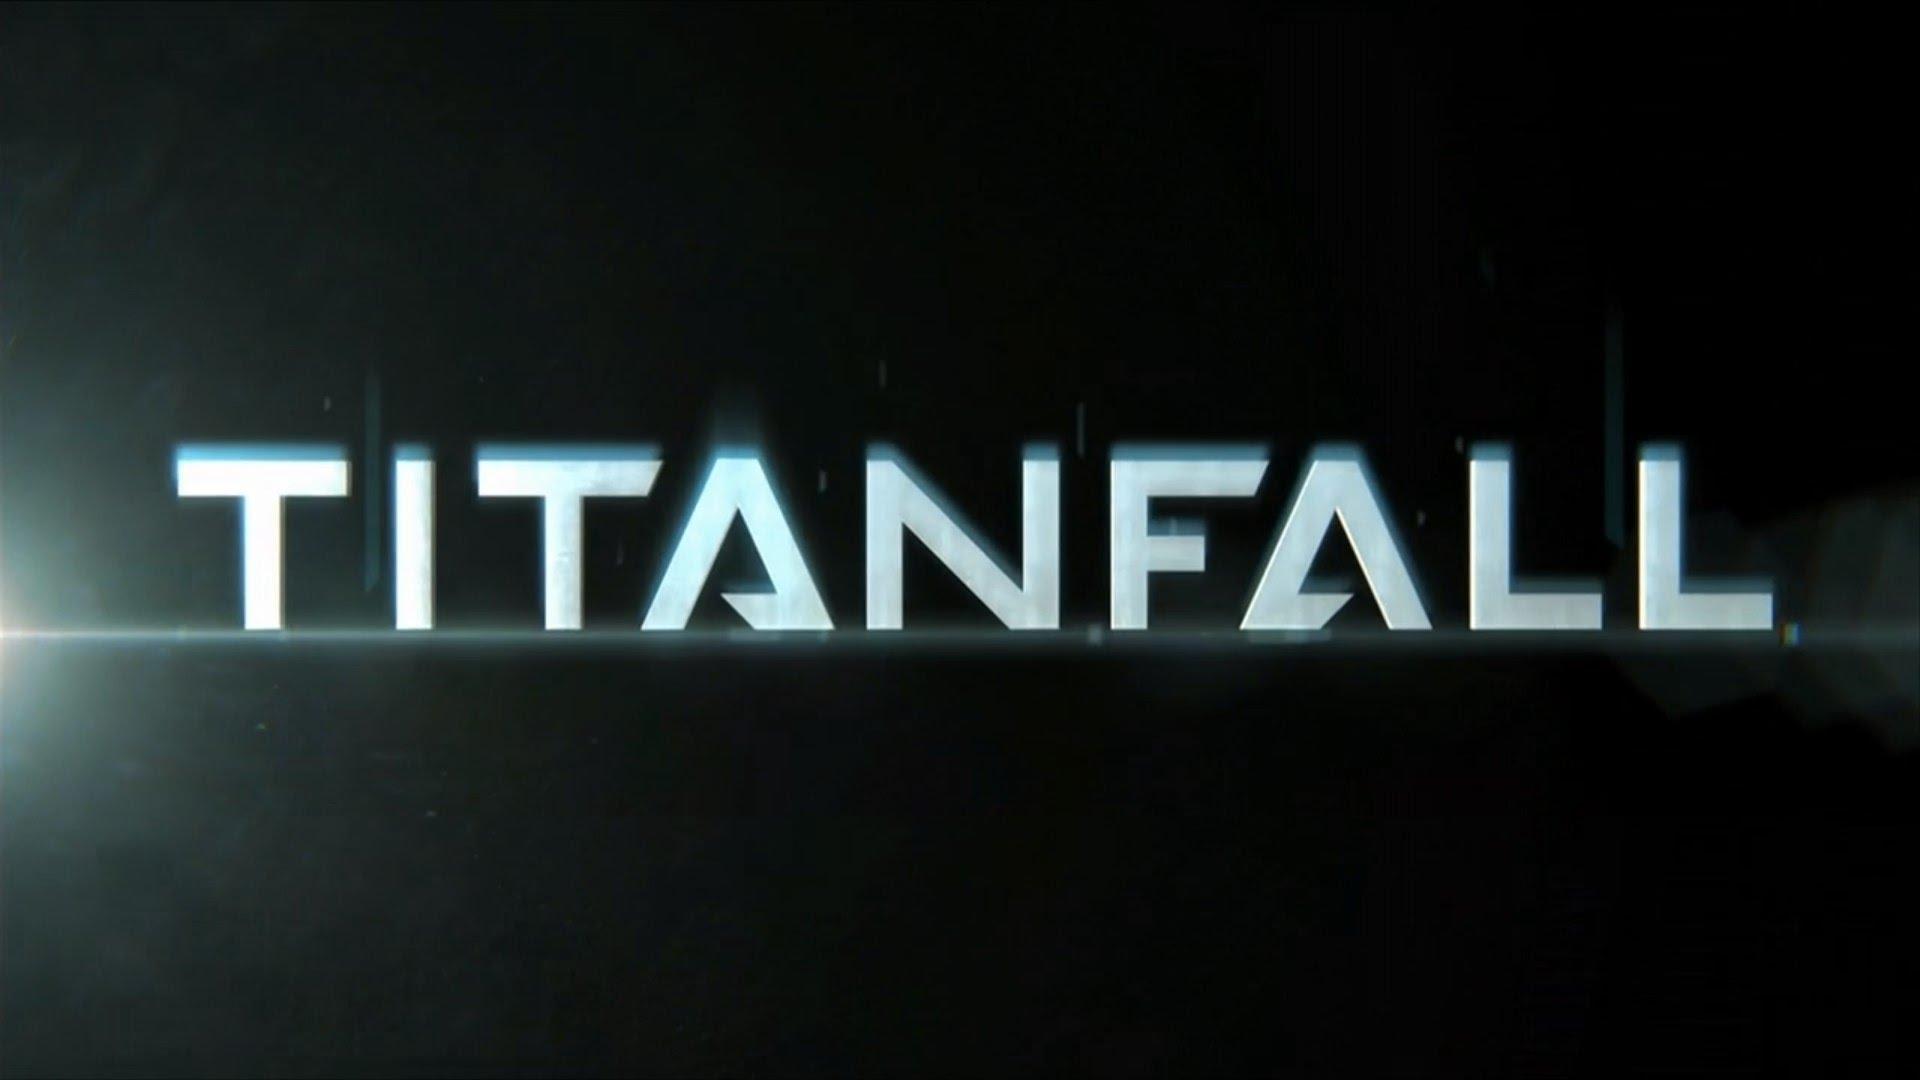 titanfall-logo-pictures-hd-wallpaper-fantasy-action-adventure-photo-titanfall-wallpaper.jpg